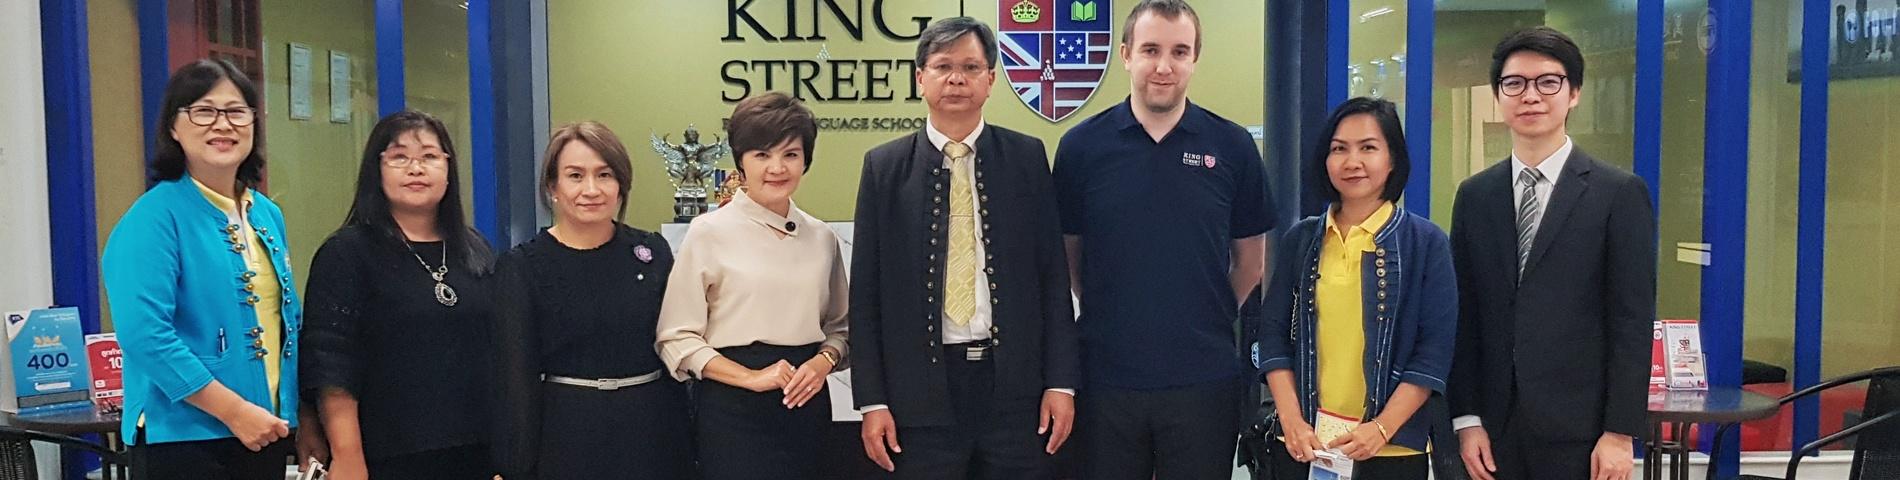 King Street English Language School immagine 1